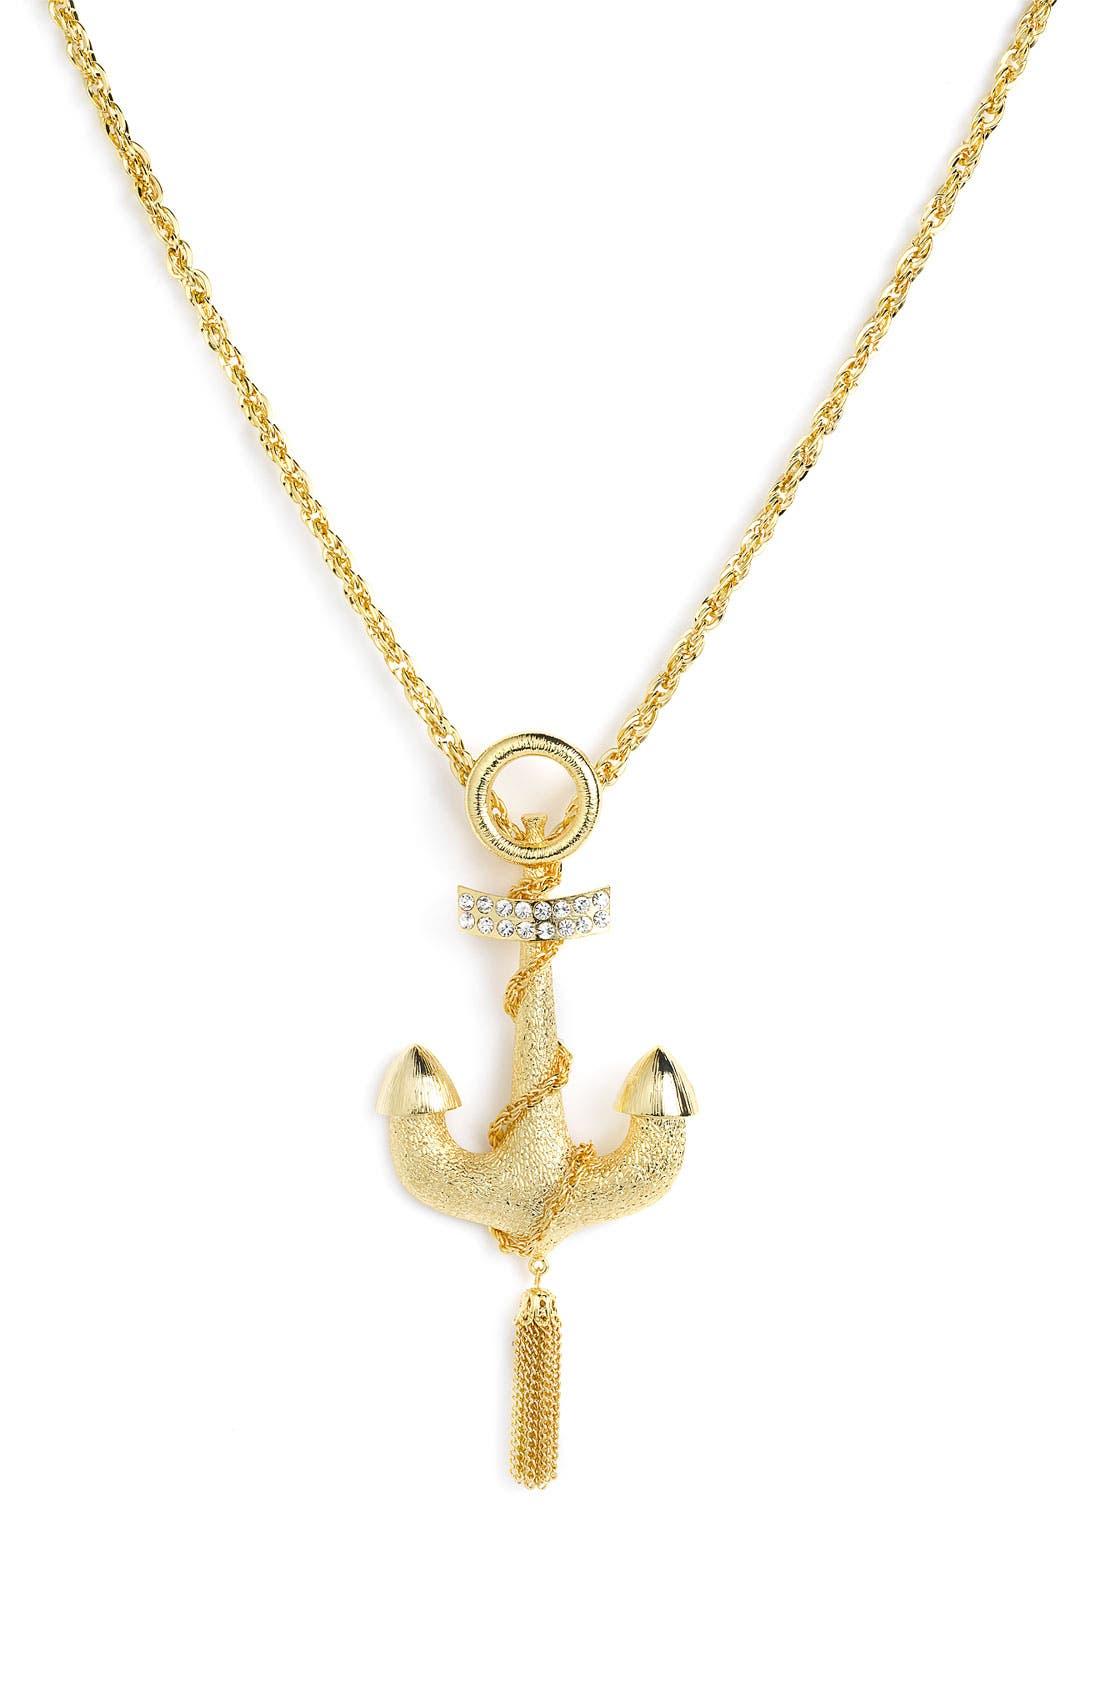 Main Image - Spring Street Design Group Anchor Pendant Necklace